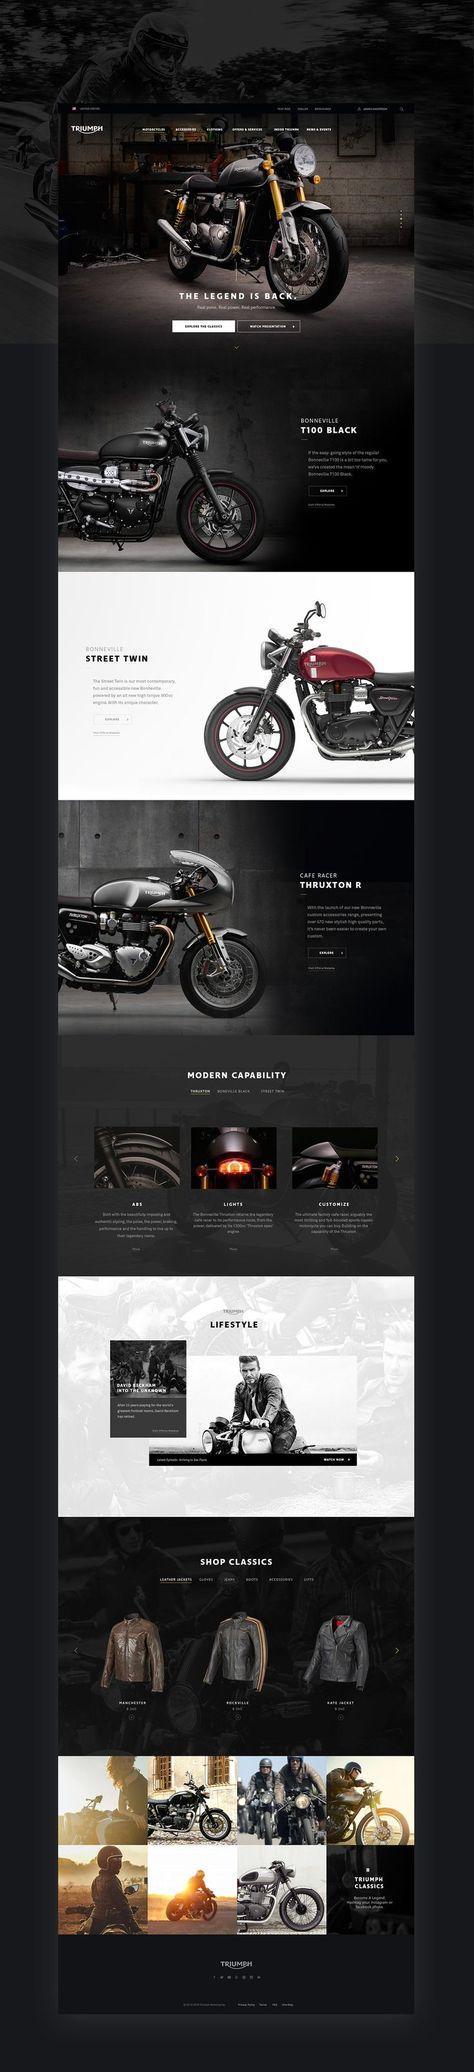 Triumph Motorcycles Website